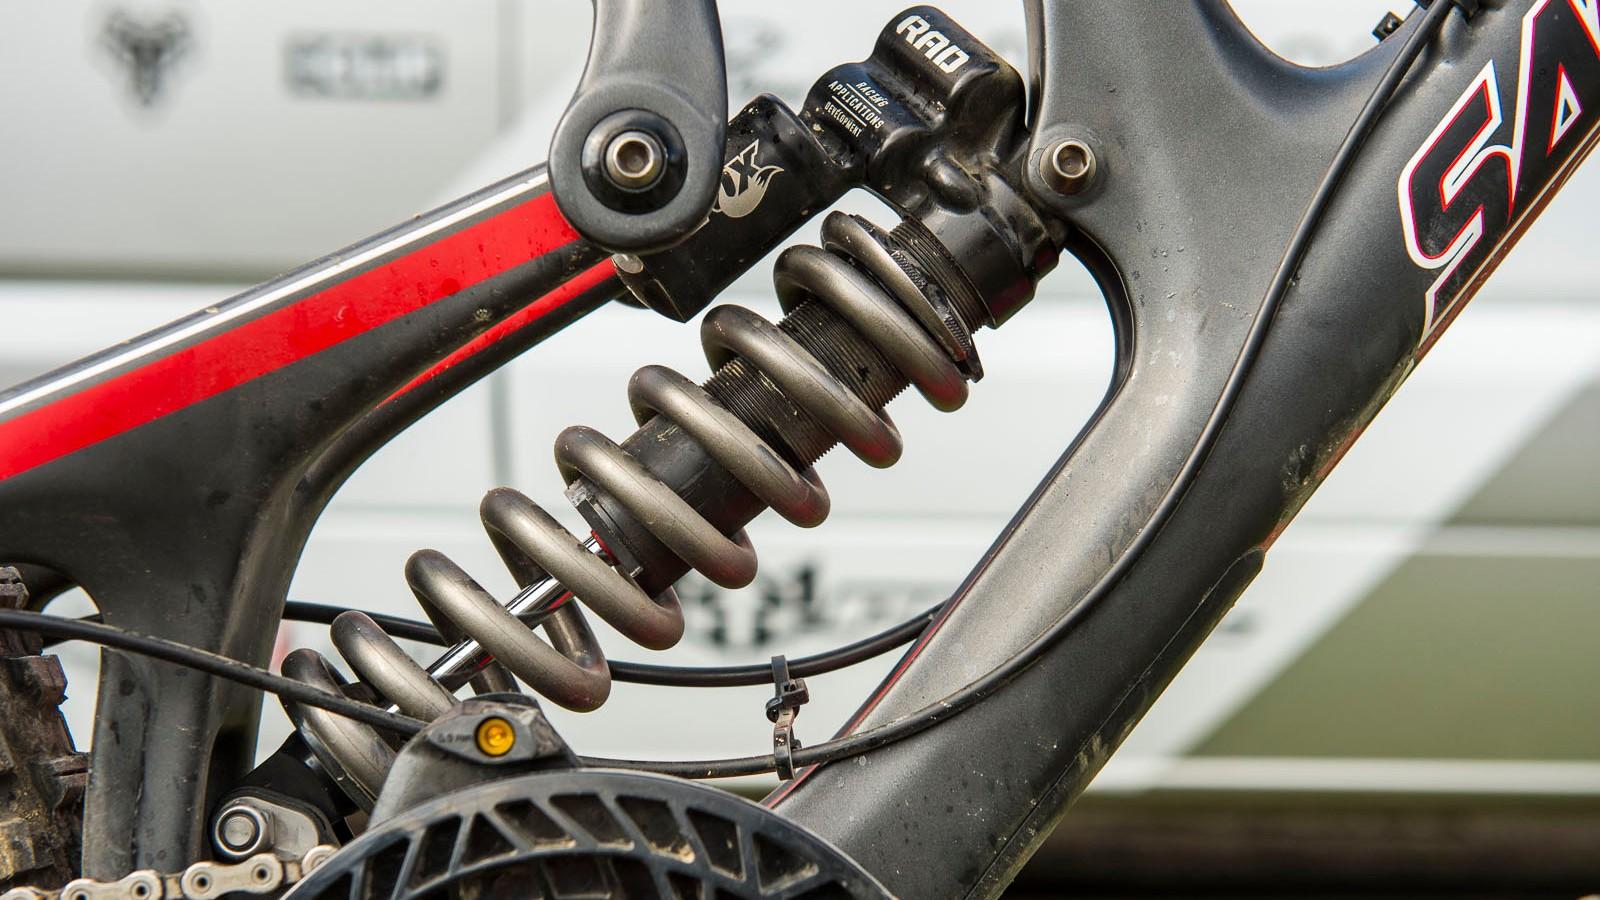 The RAD shock mounted in Josh Bryceland's race-winning Santa Cruz V10. The RAD already has a good few race wins under its belt